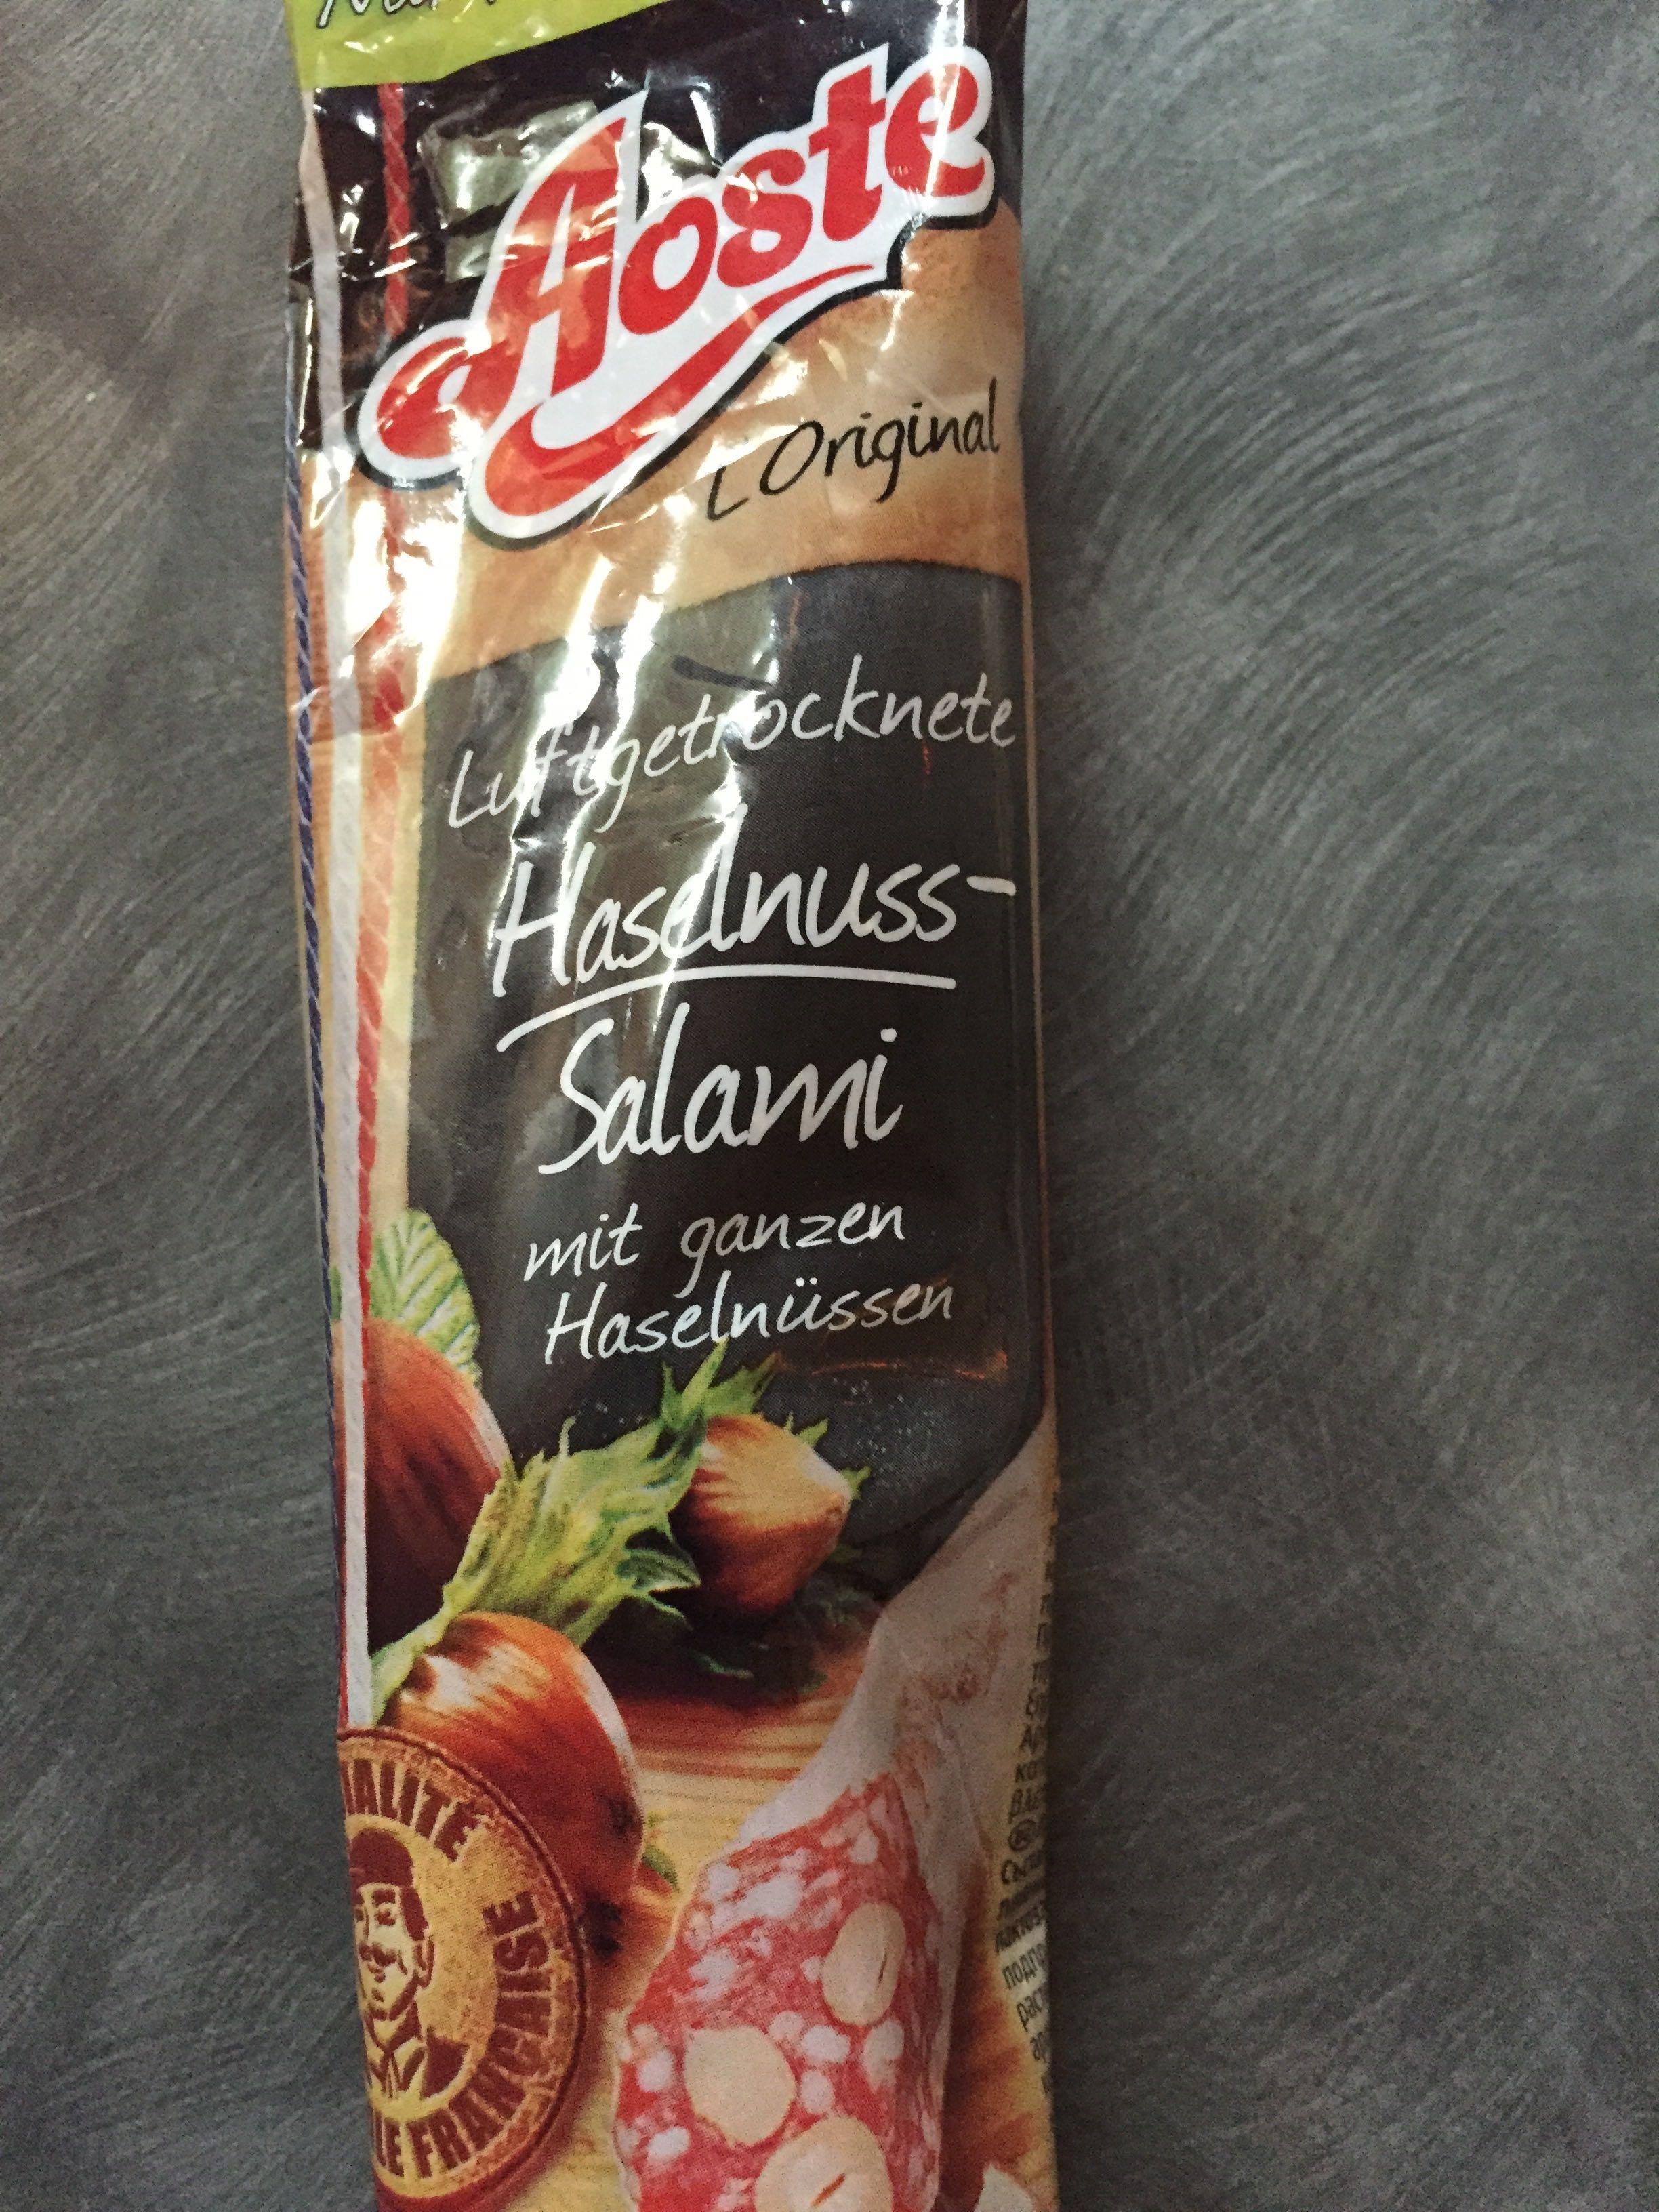 Haselnuss salami - Product